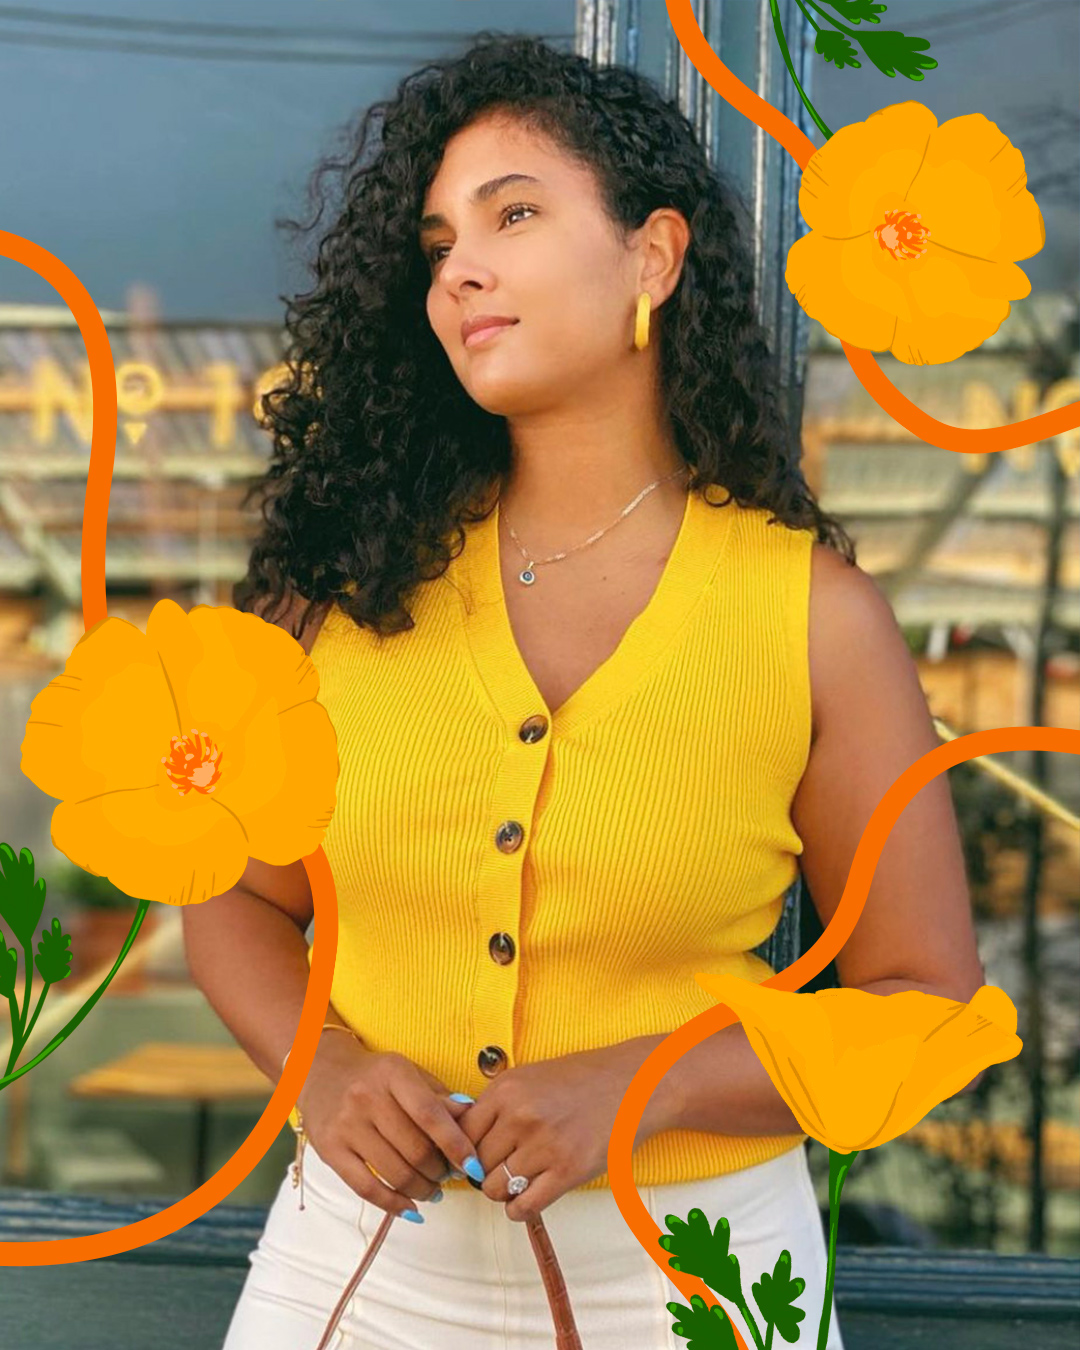 Portrait of Thatiana Diaz